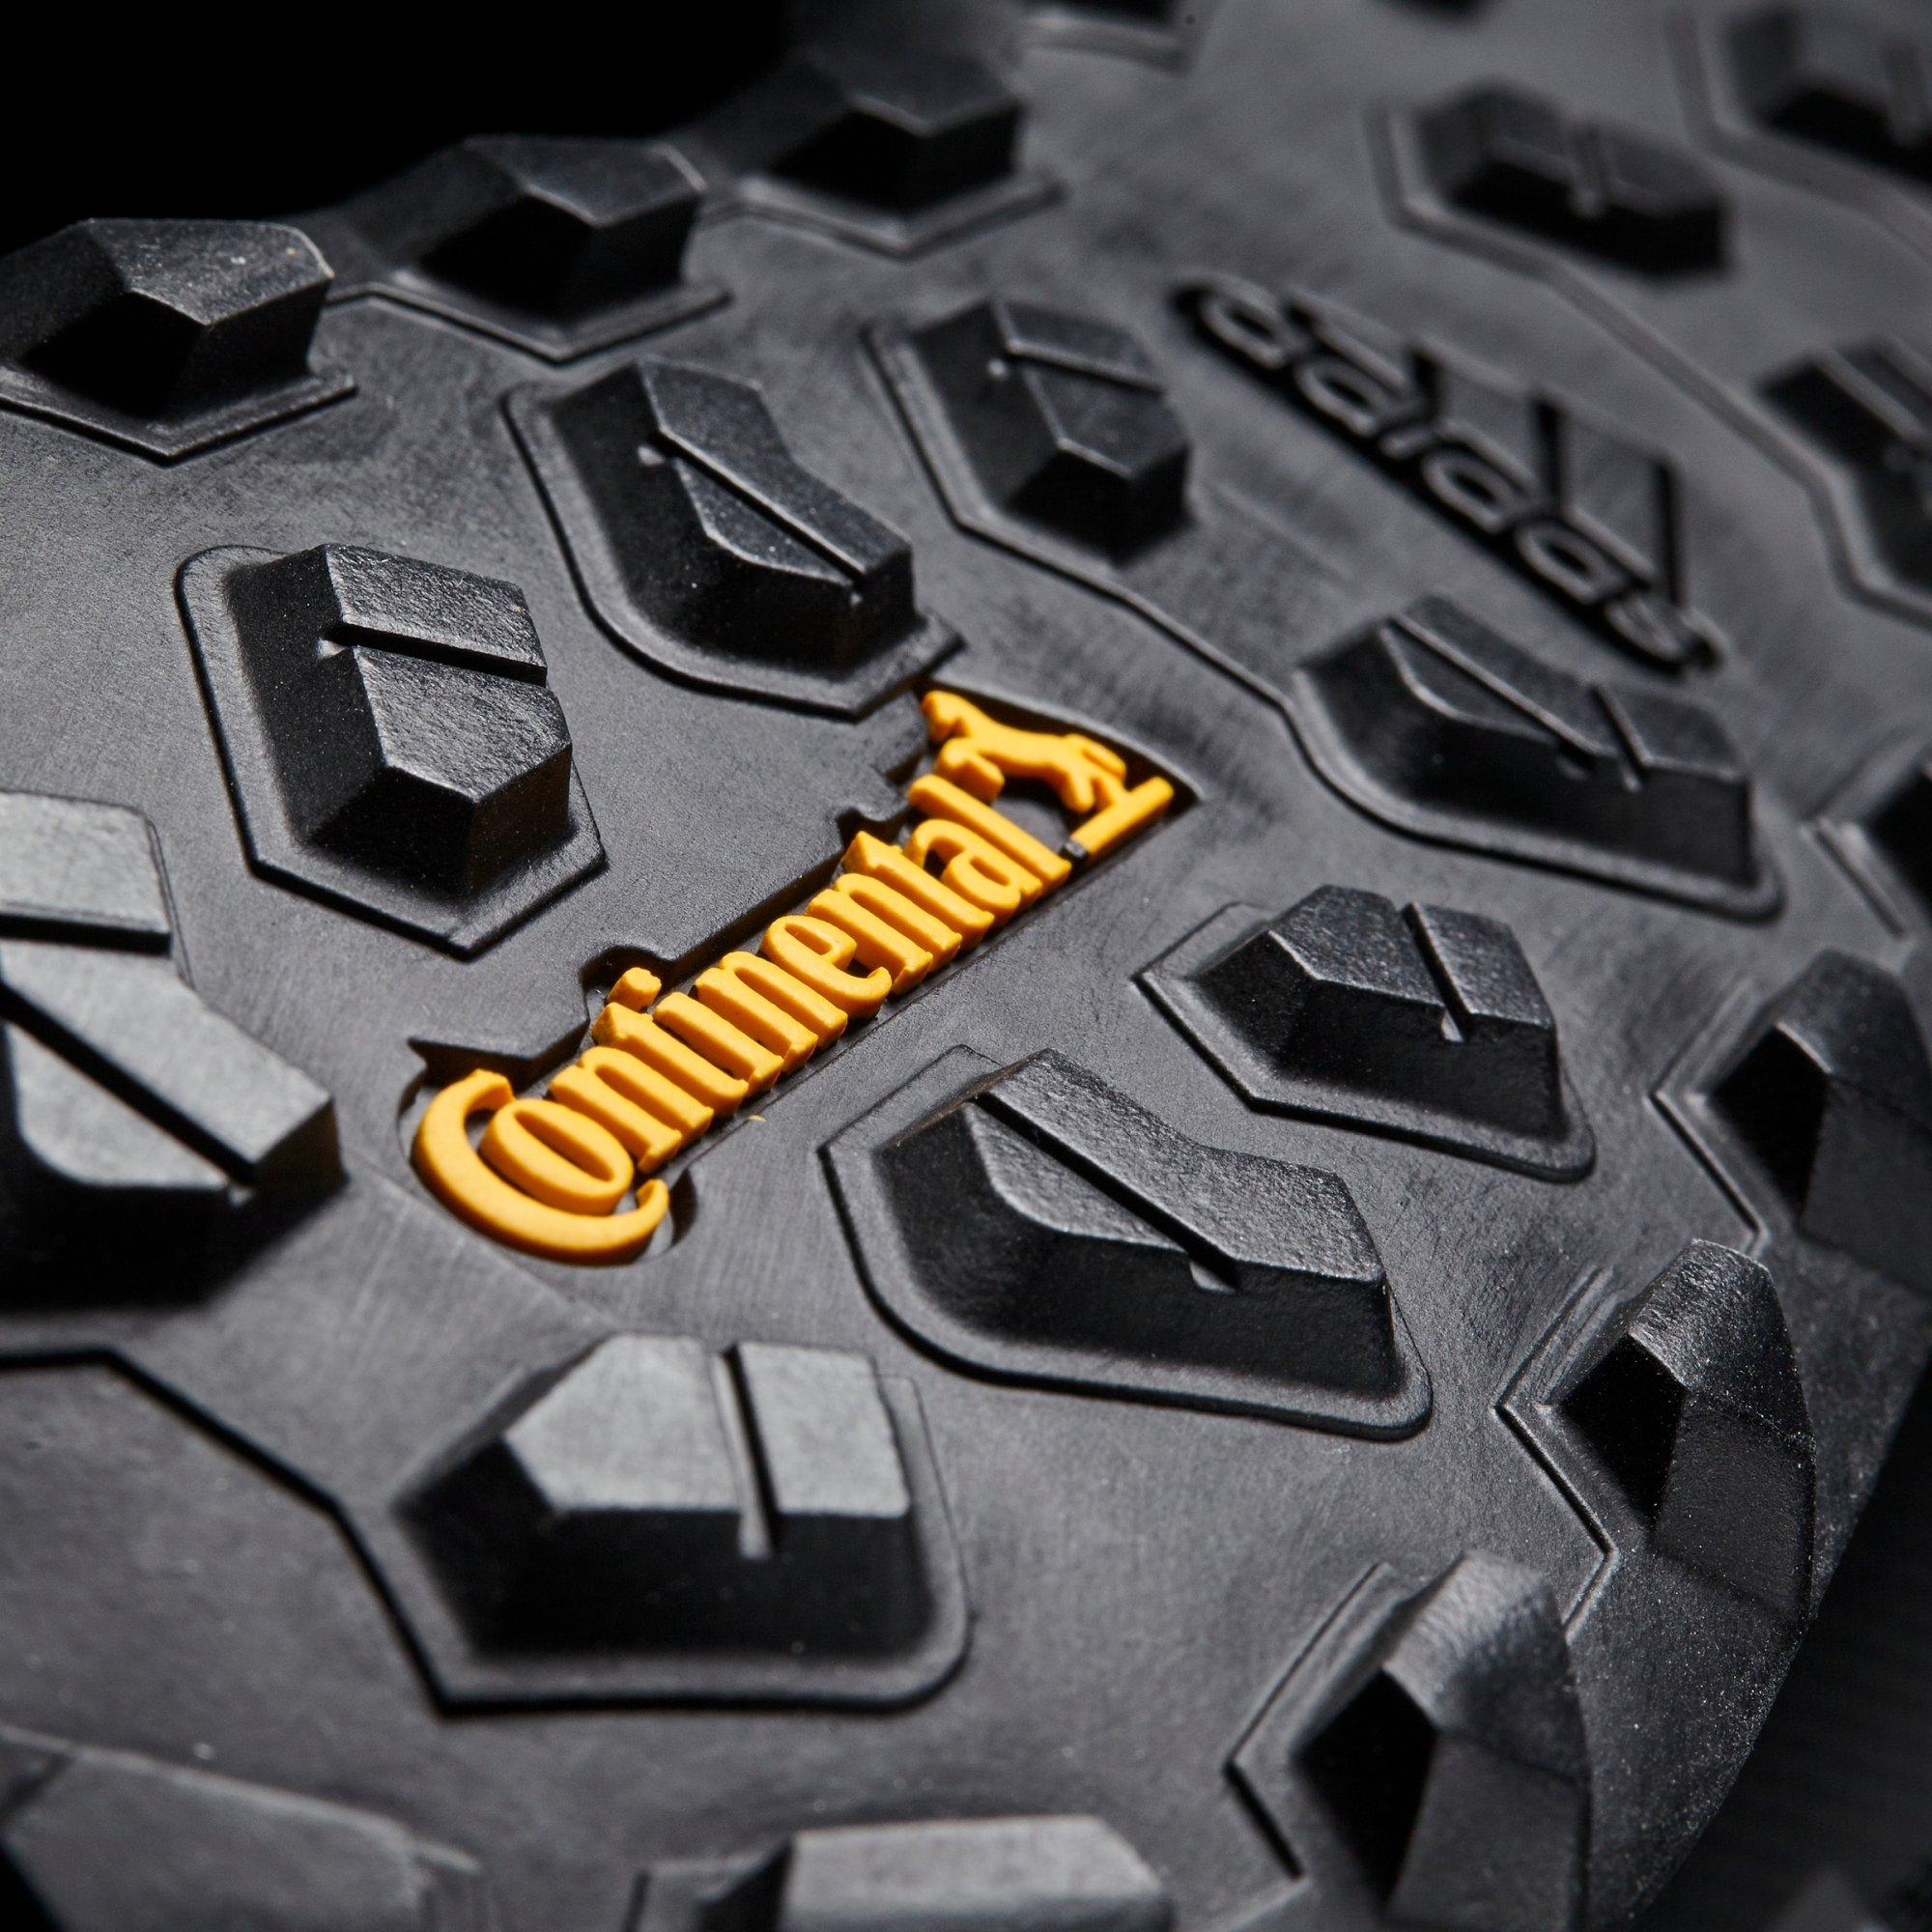 buty adidas Terrex CMTK S80873 r44 timsport_pl 7424689400